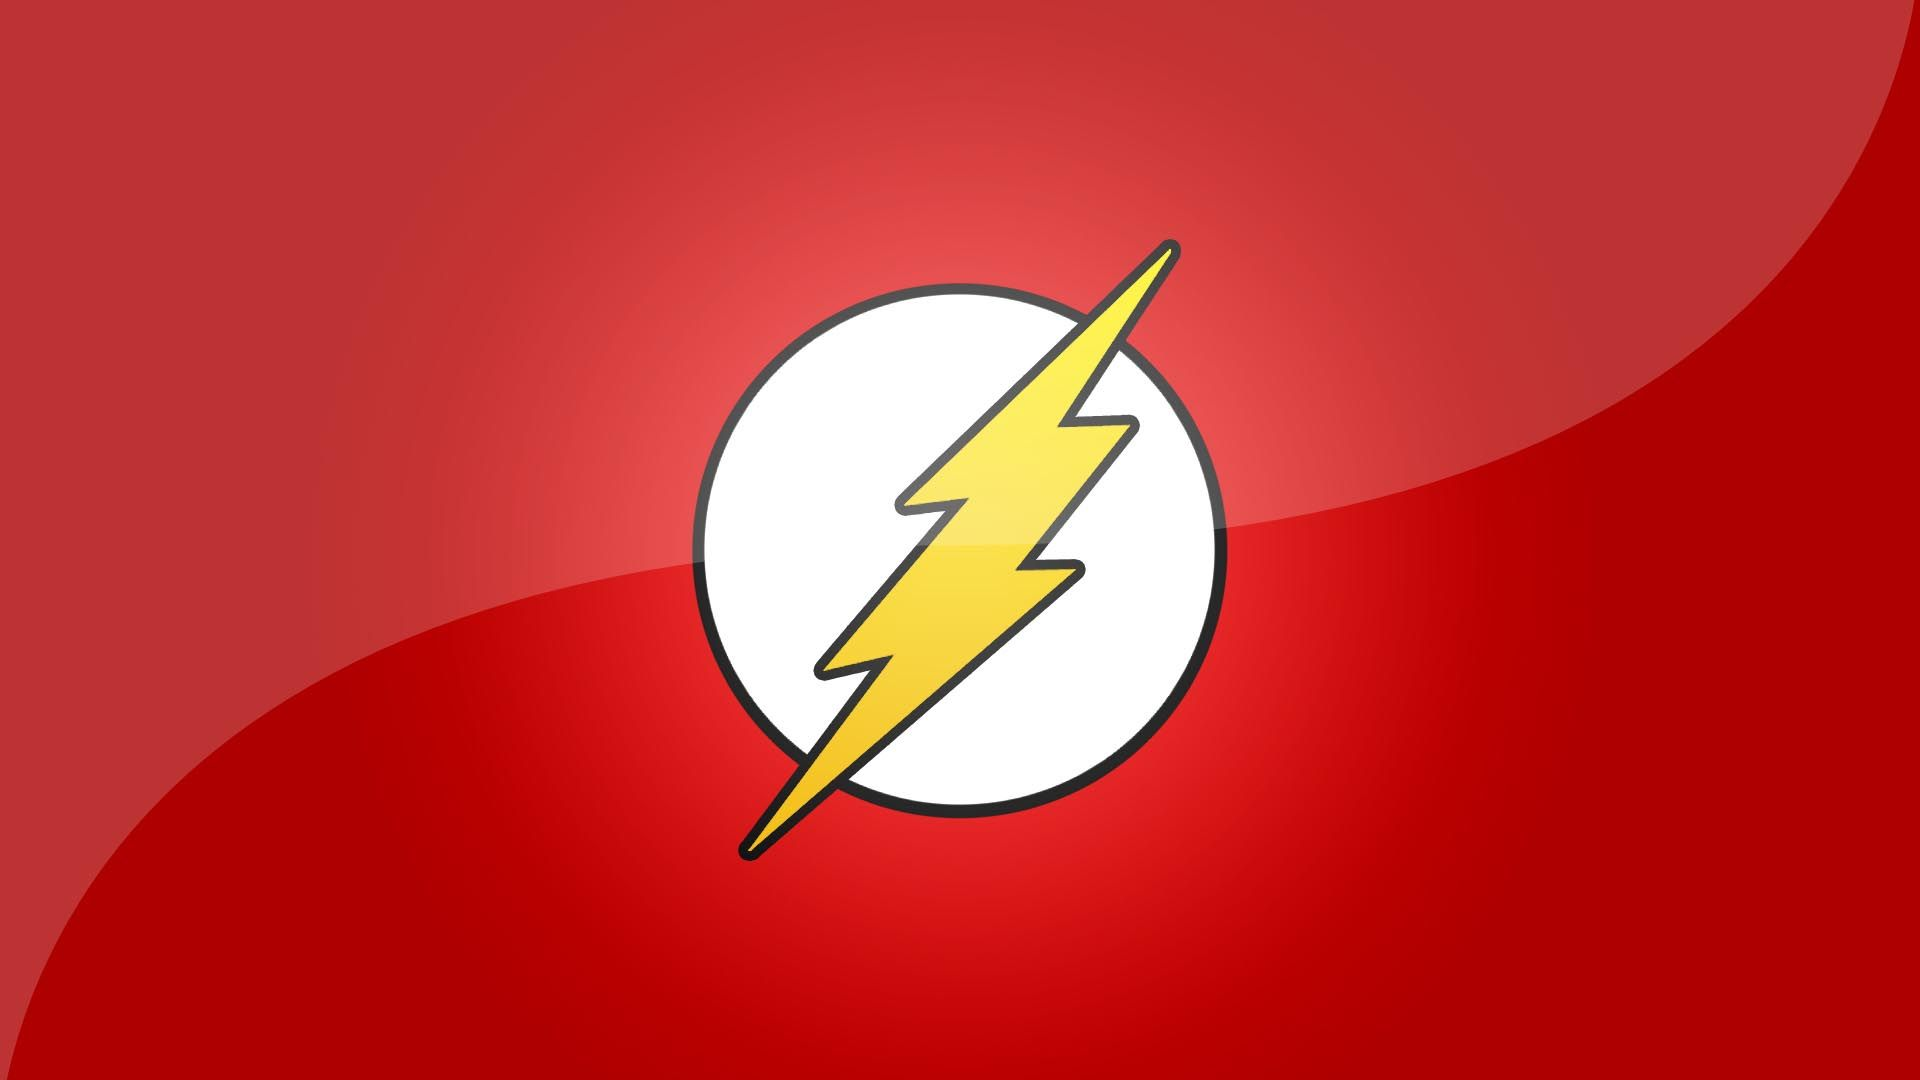 the flash flash superhero dc comics the flash pinterest rh pinterest com au dc logo wallpaper free download ac dc logo wallpaper